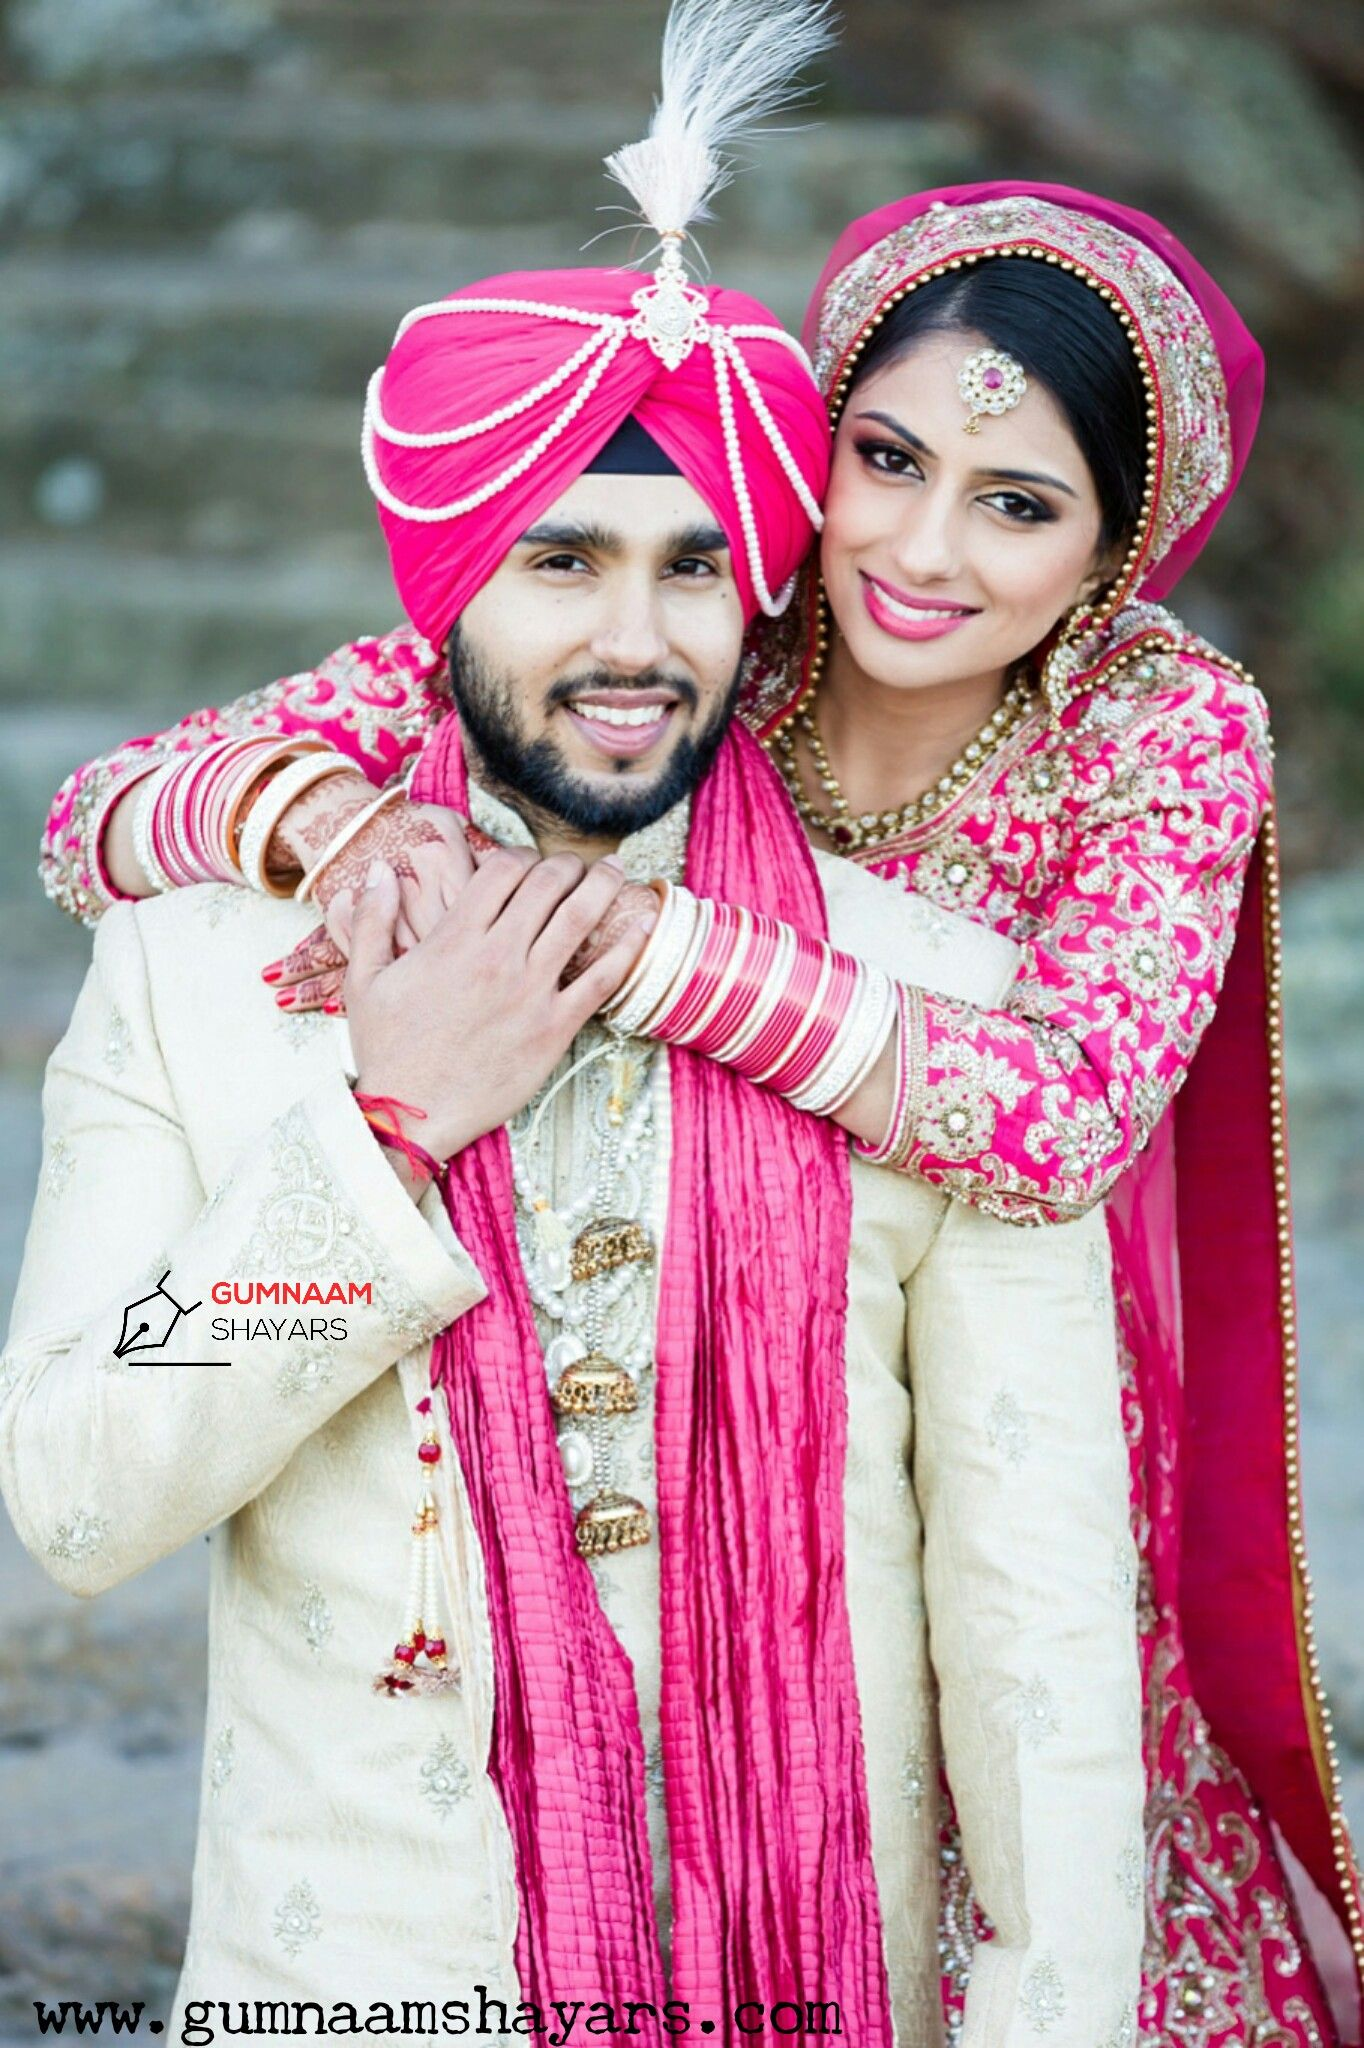 Pin de Gumnaam Shayars en Punjabi Couple | Pinterest